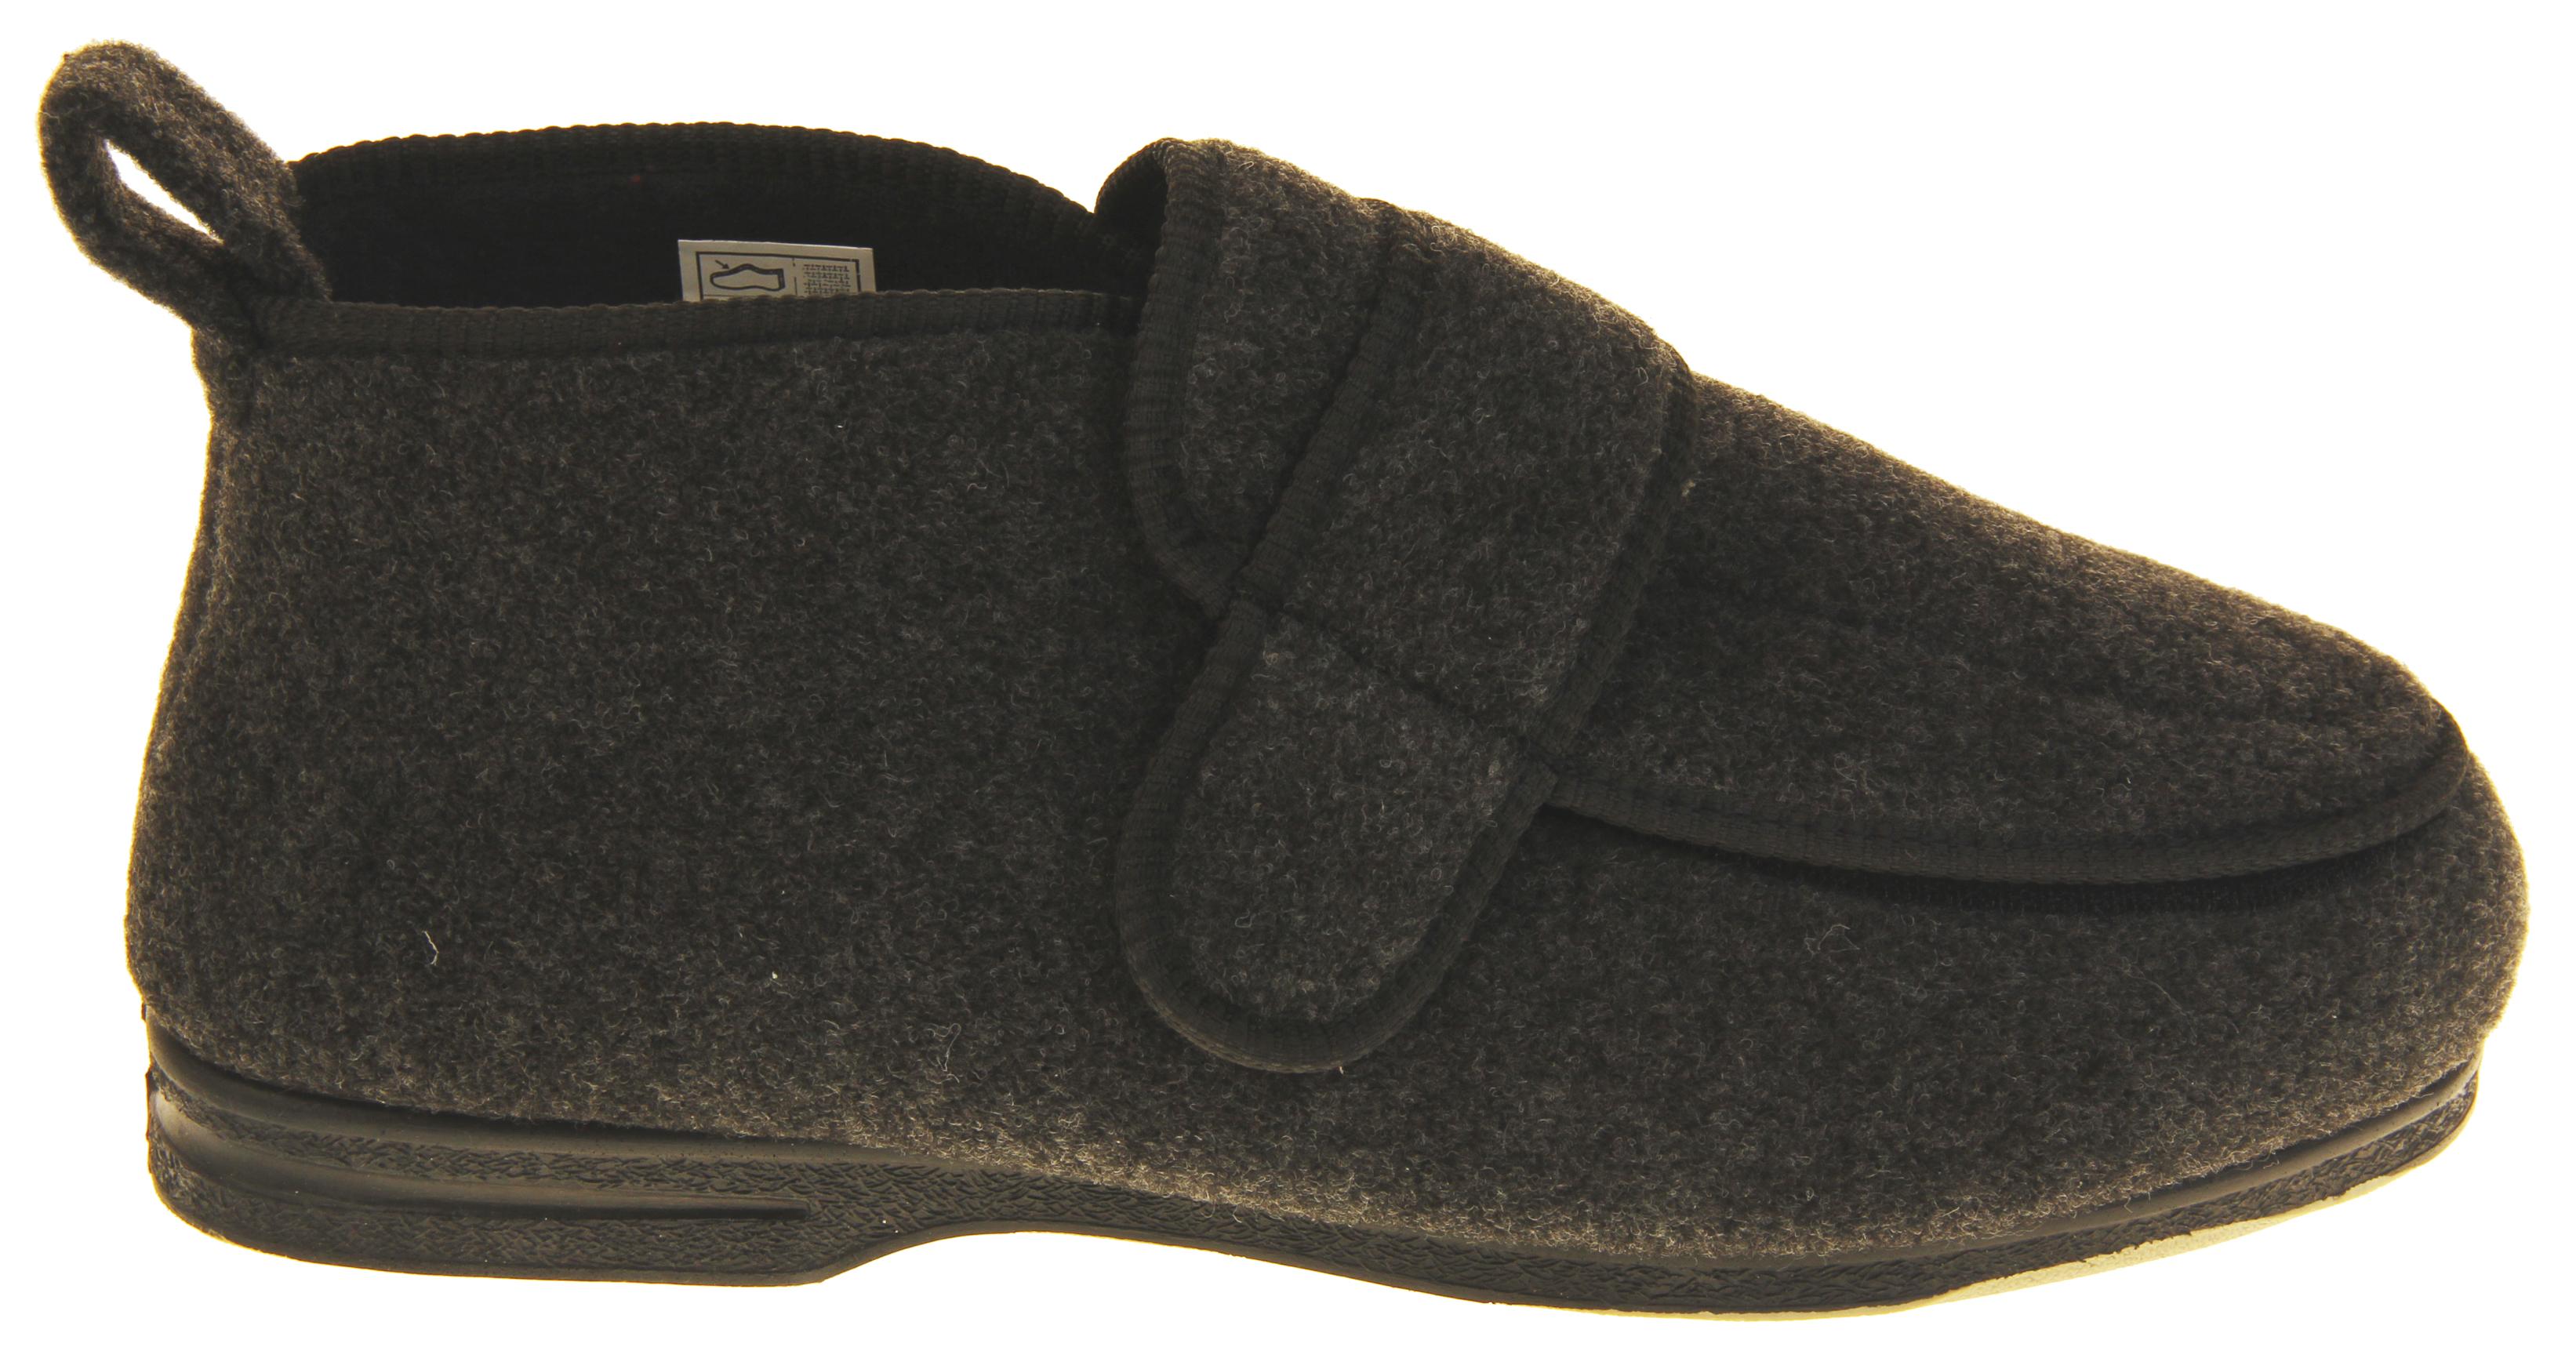 Mens Extra Wide Slippers Mens Wide Fit Slippers Genuine Velcro 4E Width EEEE